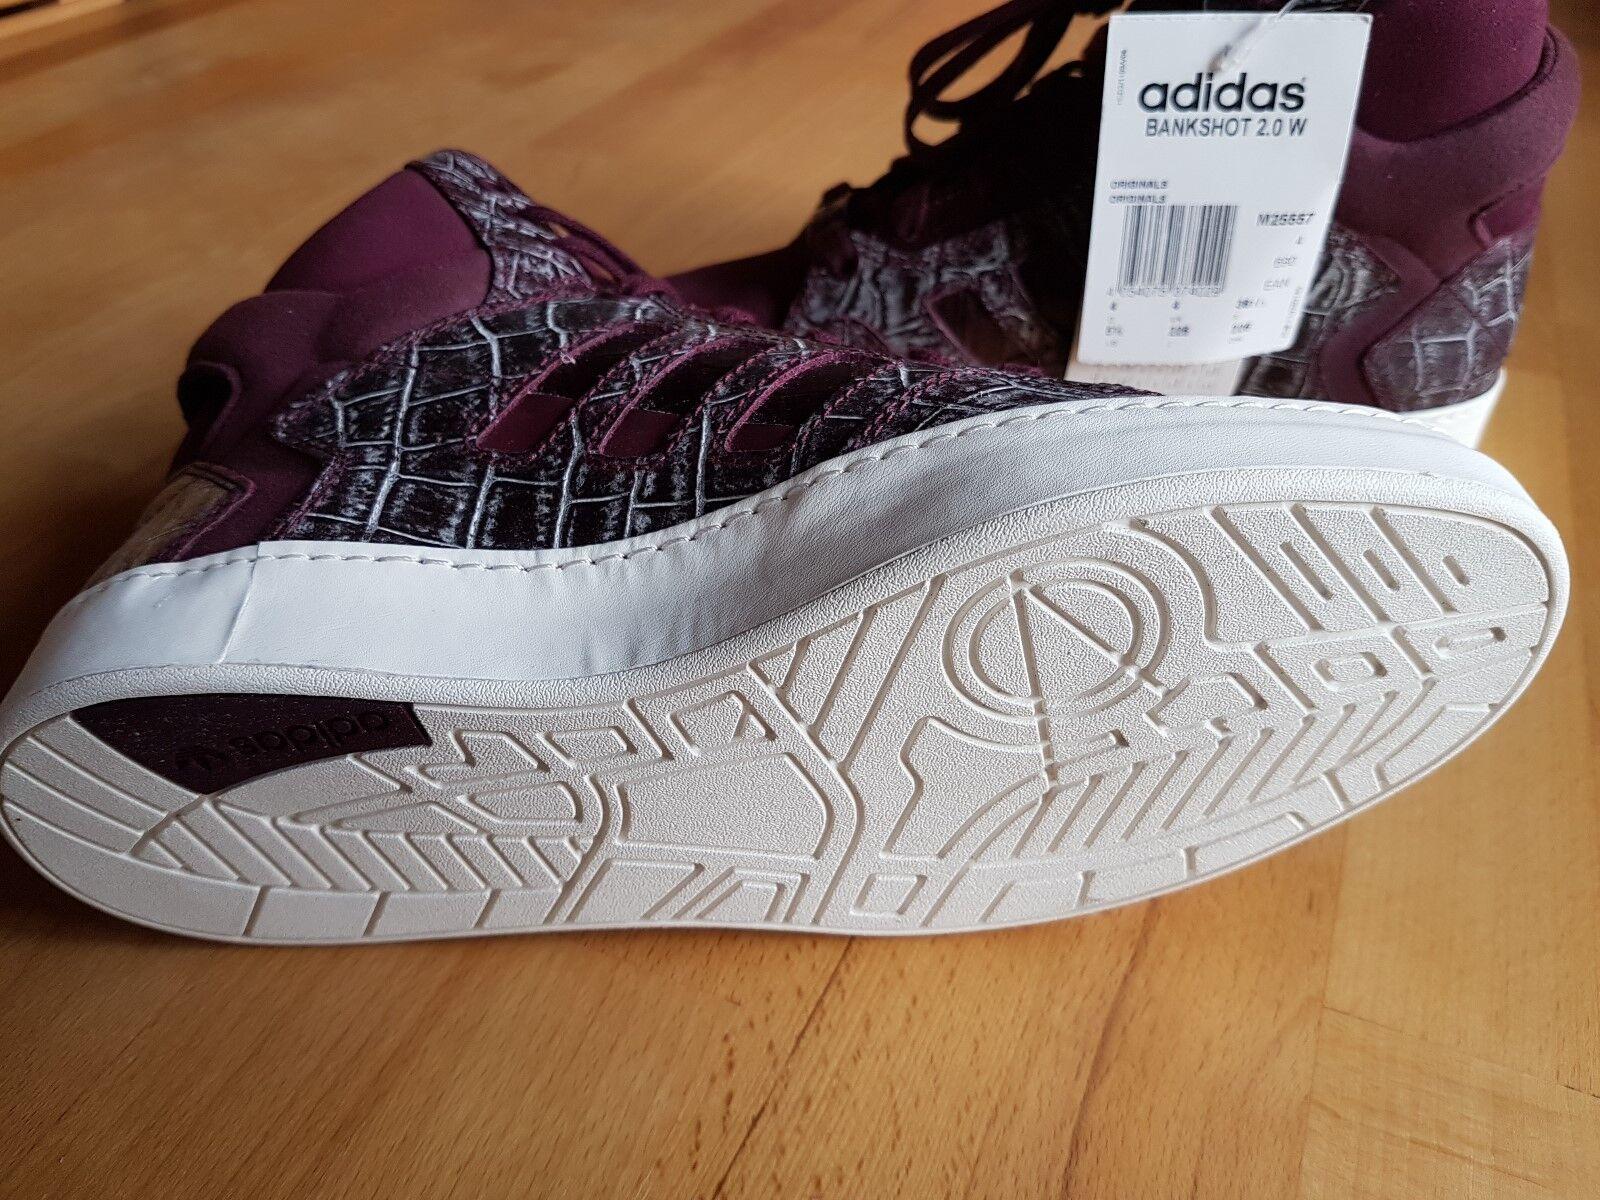 Adidas - Damen Kinder 0 Sneaker - BANKSHOT 2. 0 Kinder W - ,36 2/3, Maroon, -NEU- b0a95e